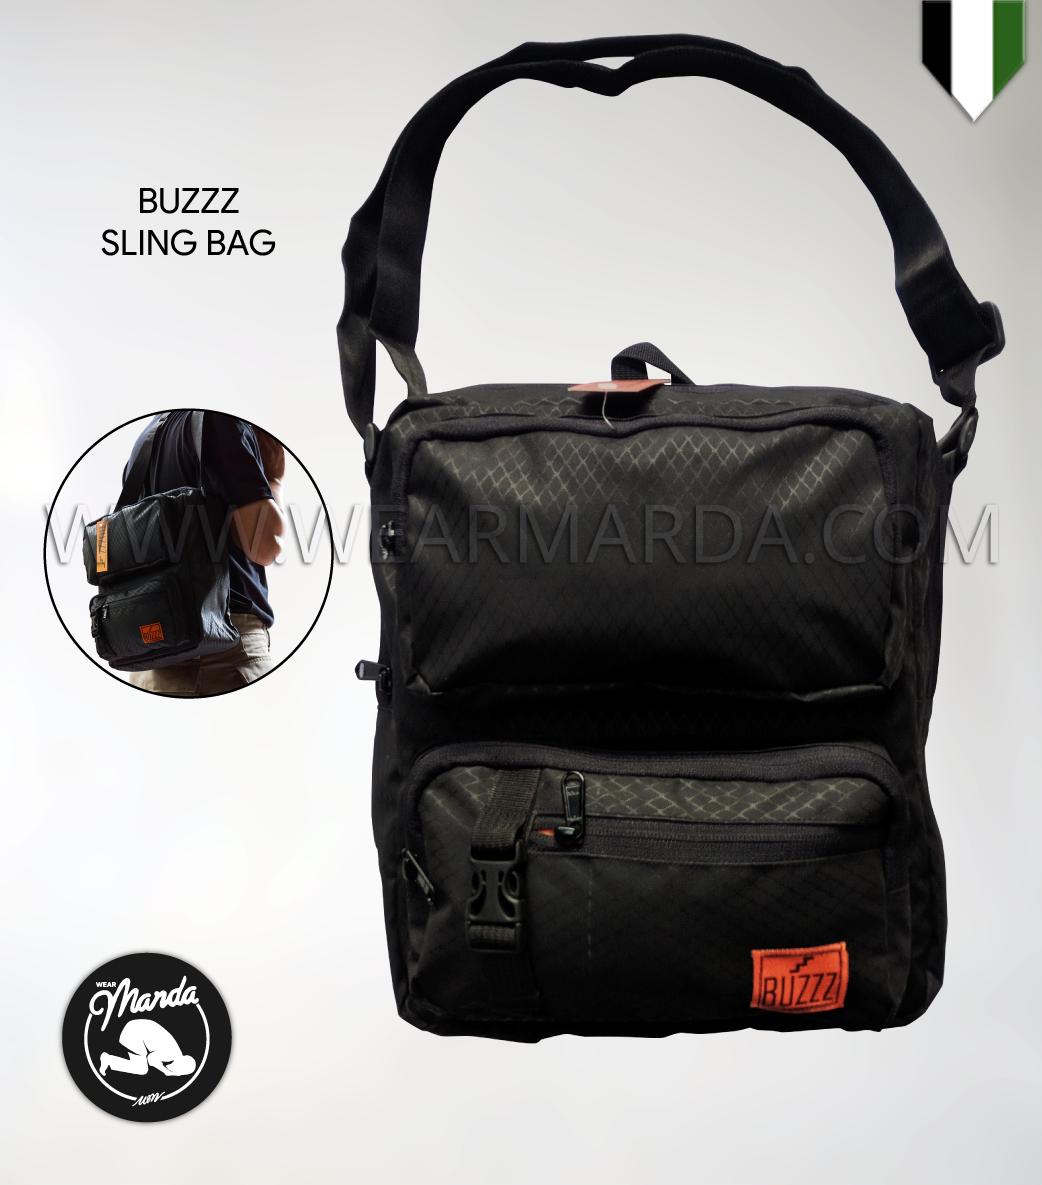 TAS SELEMPANG SLING BAG BUZZ